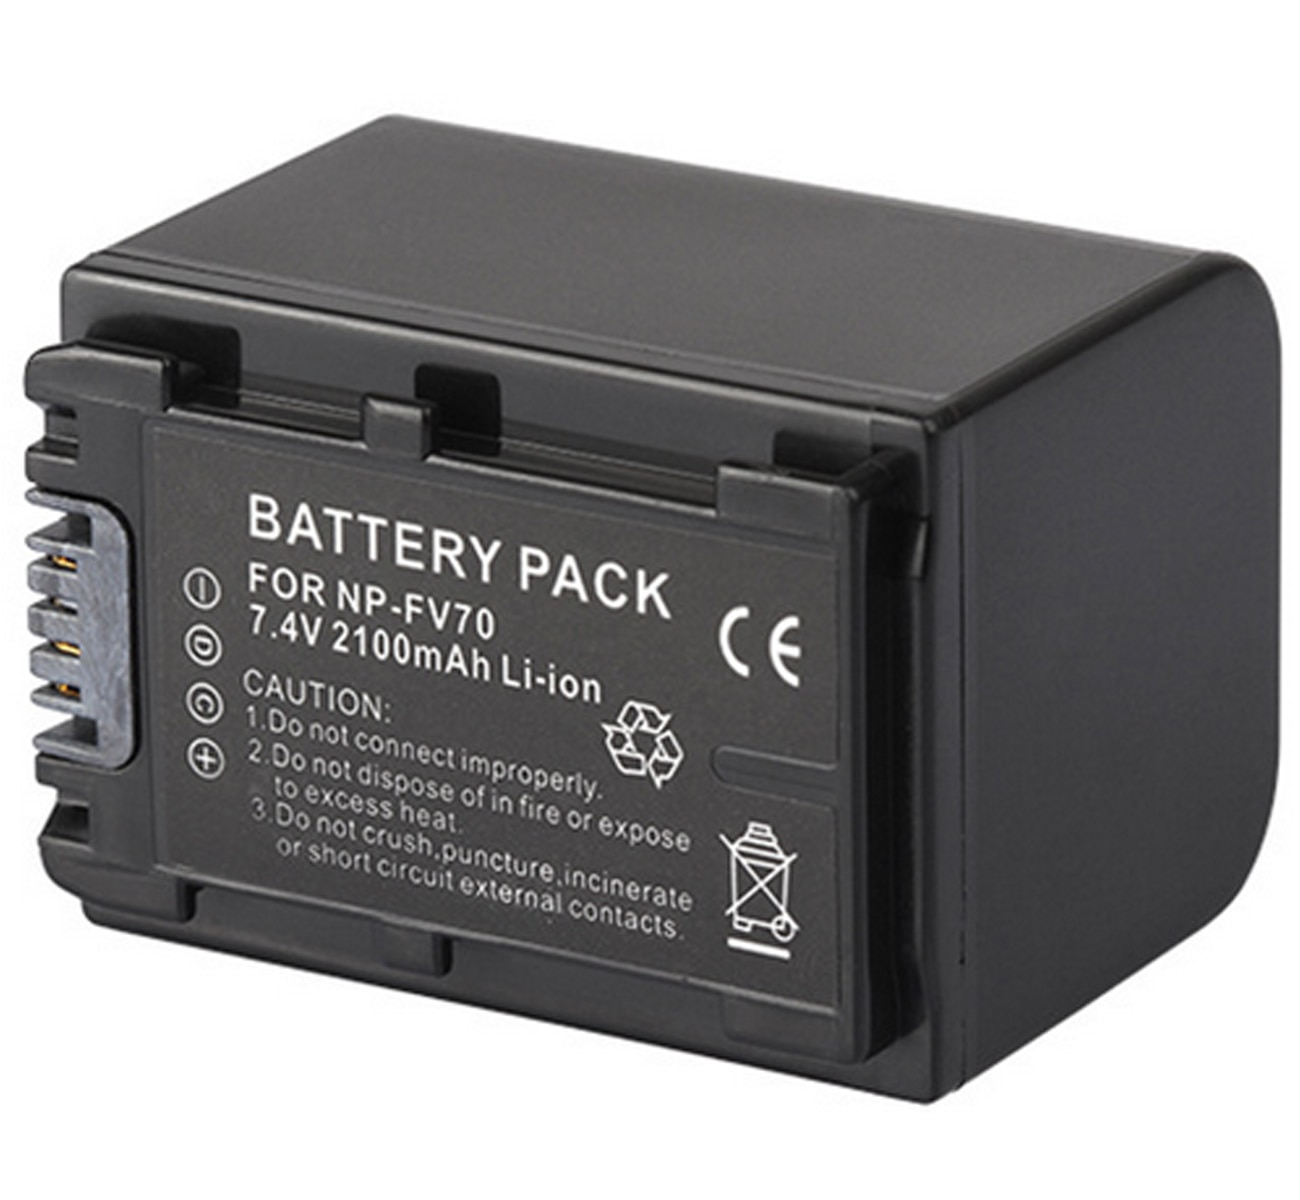 Paquete de baterías para videocámara Sony FDR-AXP33, FDR-AXP35, FDR-AXP55, HDR-TD10, HDR-TD20V, HDR-TD30V,...